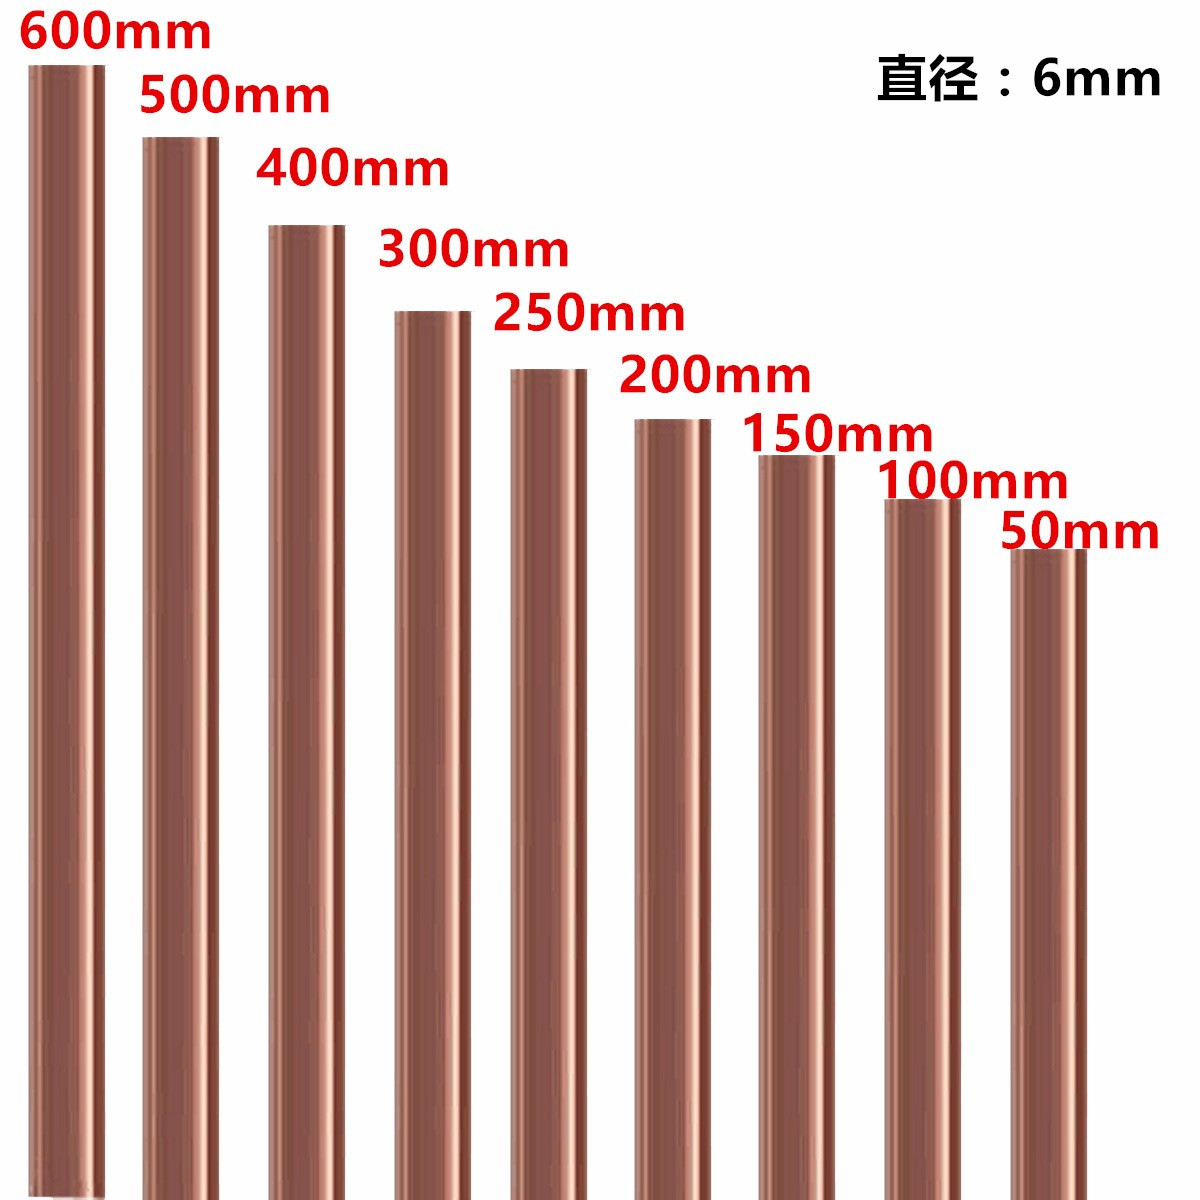 6mm Diameter 50-600mm Copper Round Bar Rod For Milling Welding Metalworking